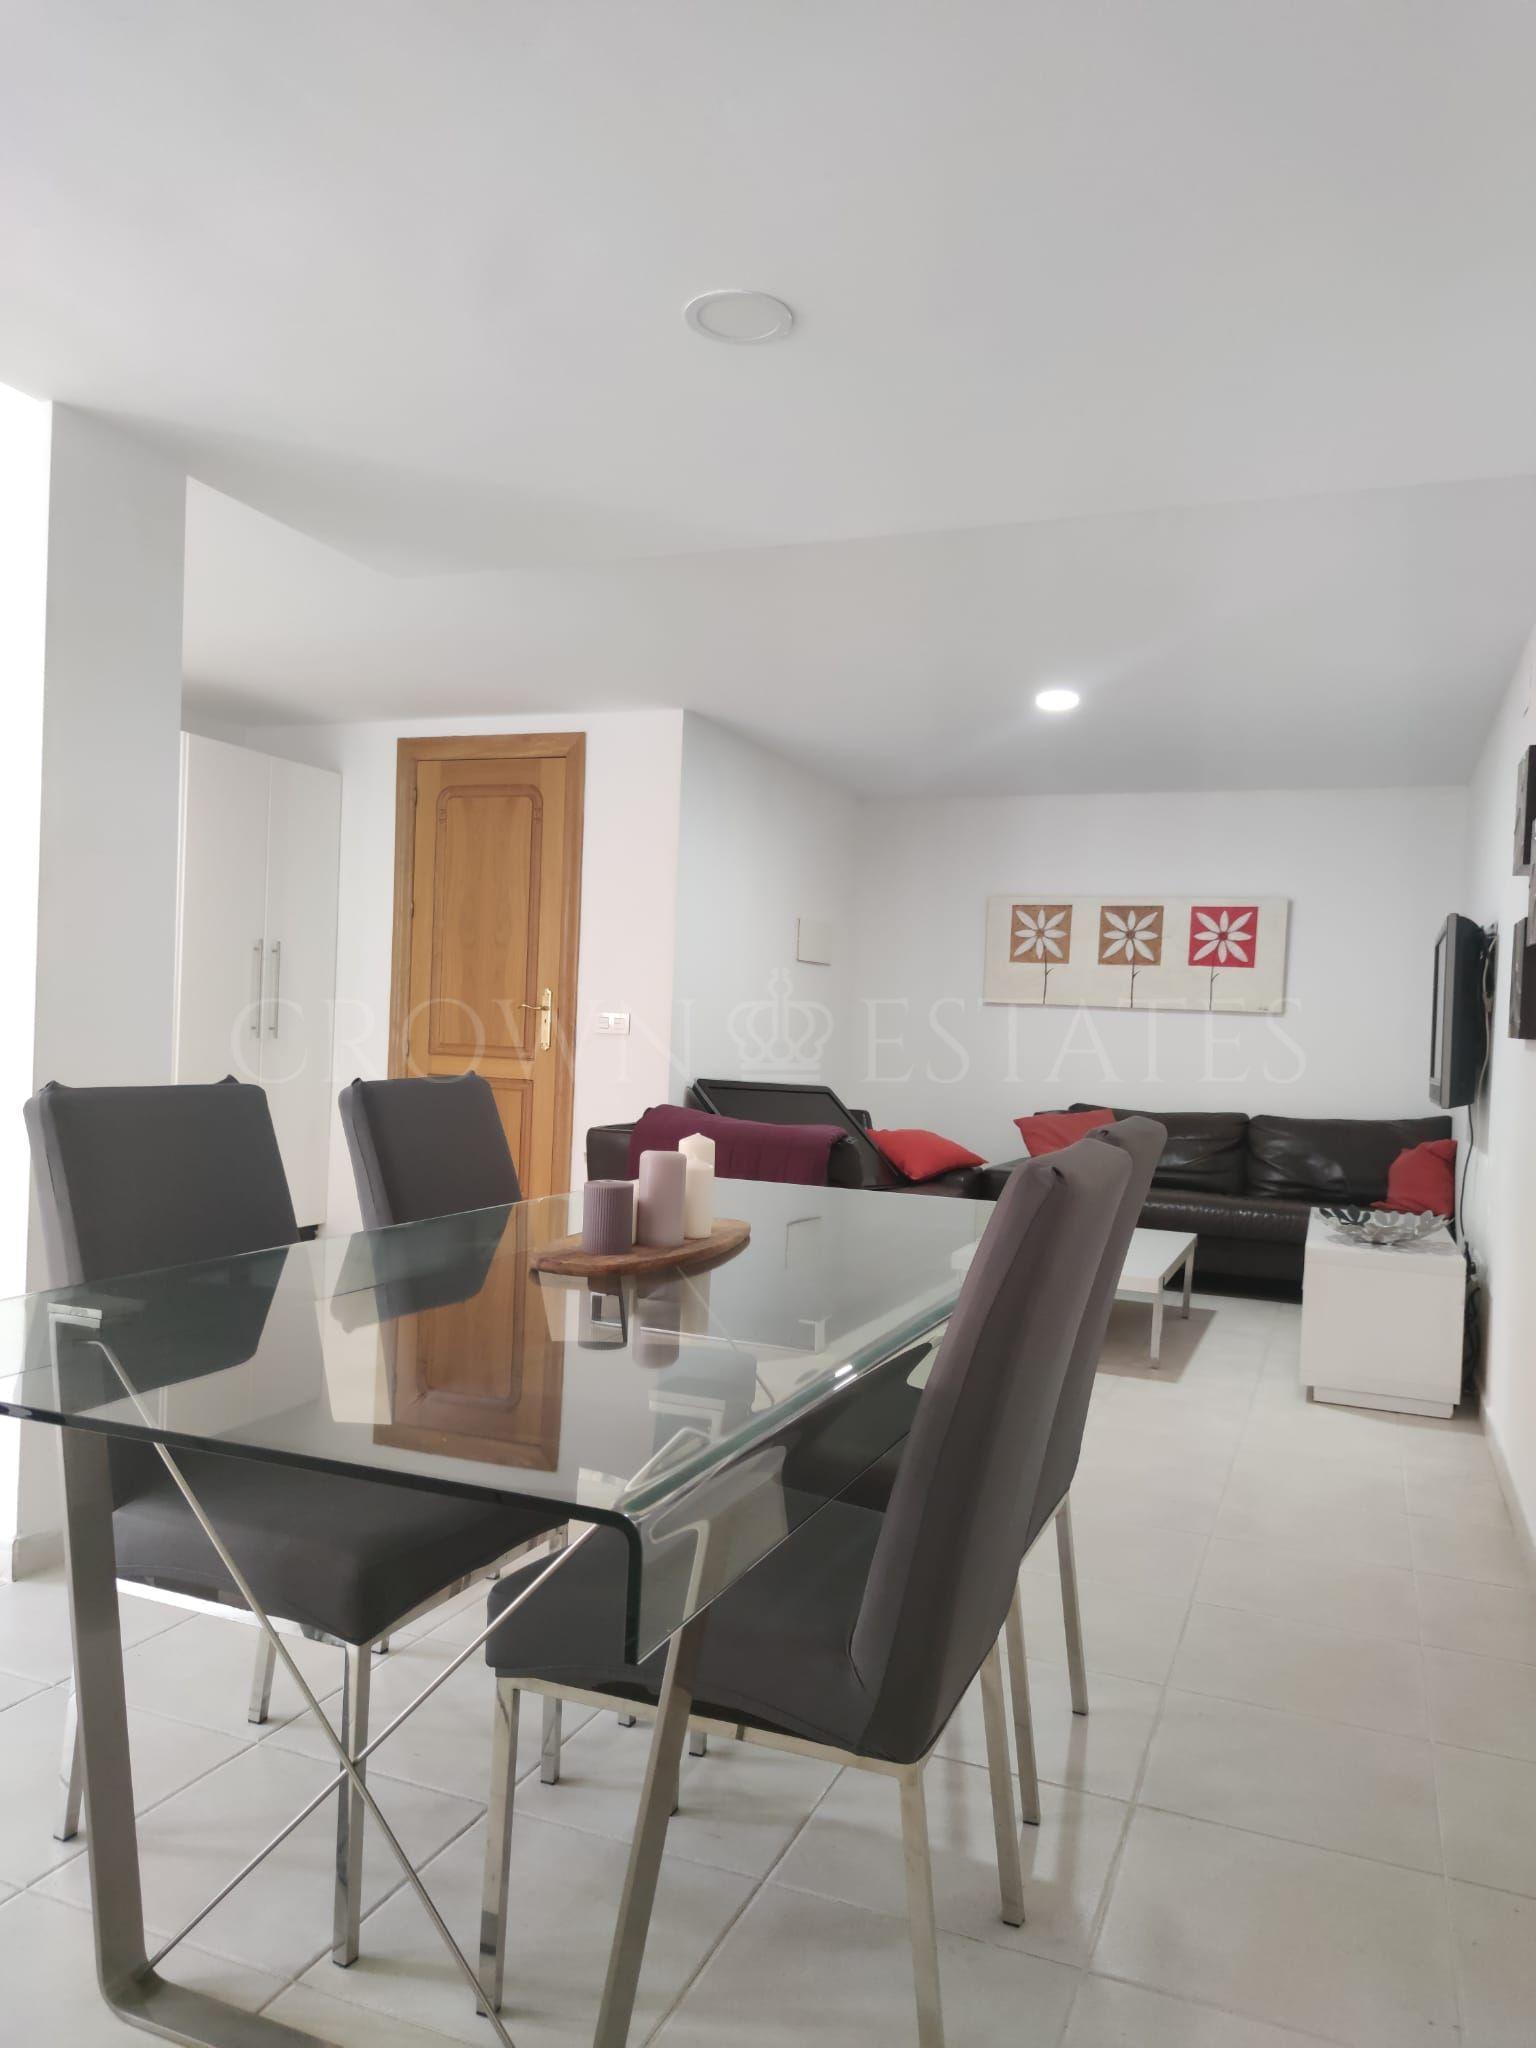 Fenomenal Semi-detached Villa in Calahonda!